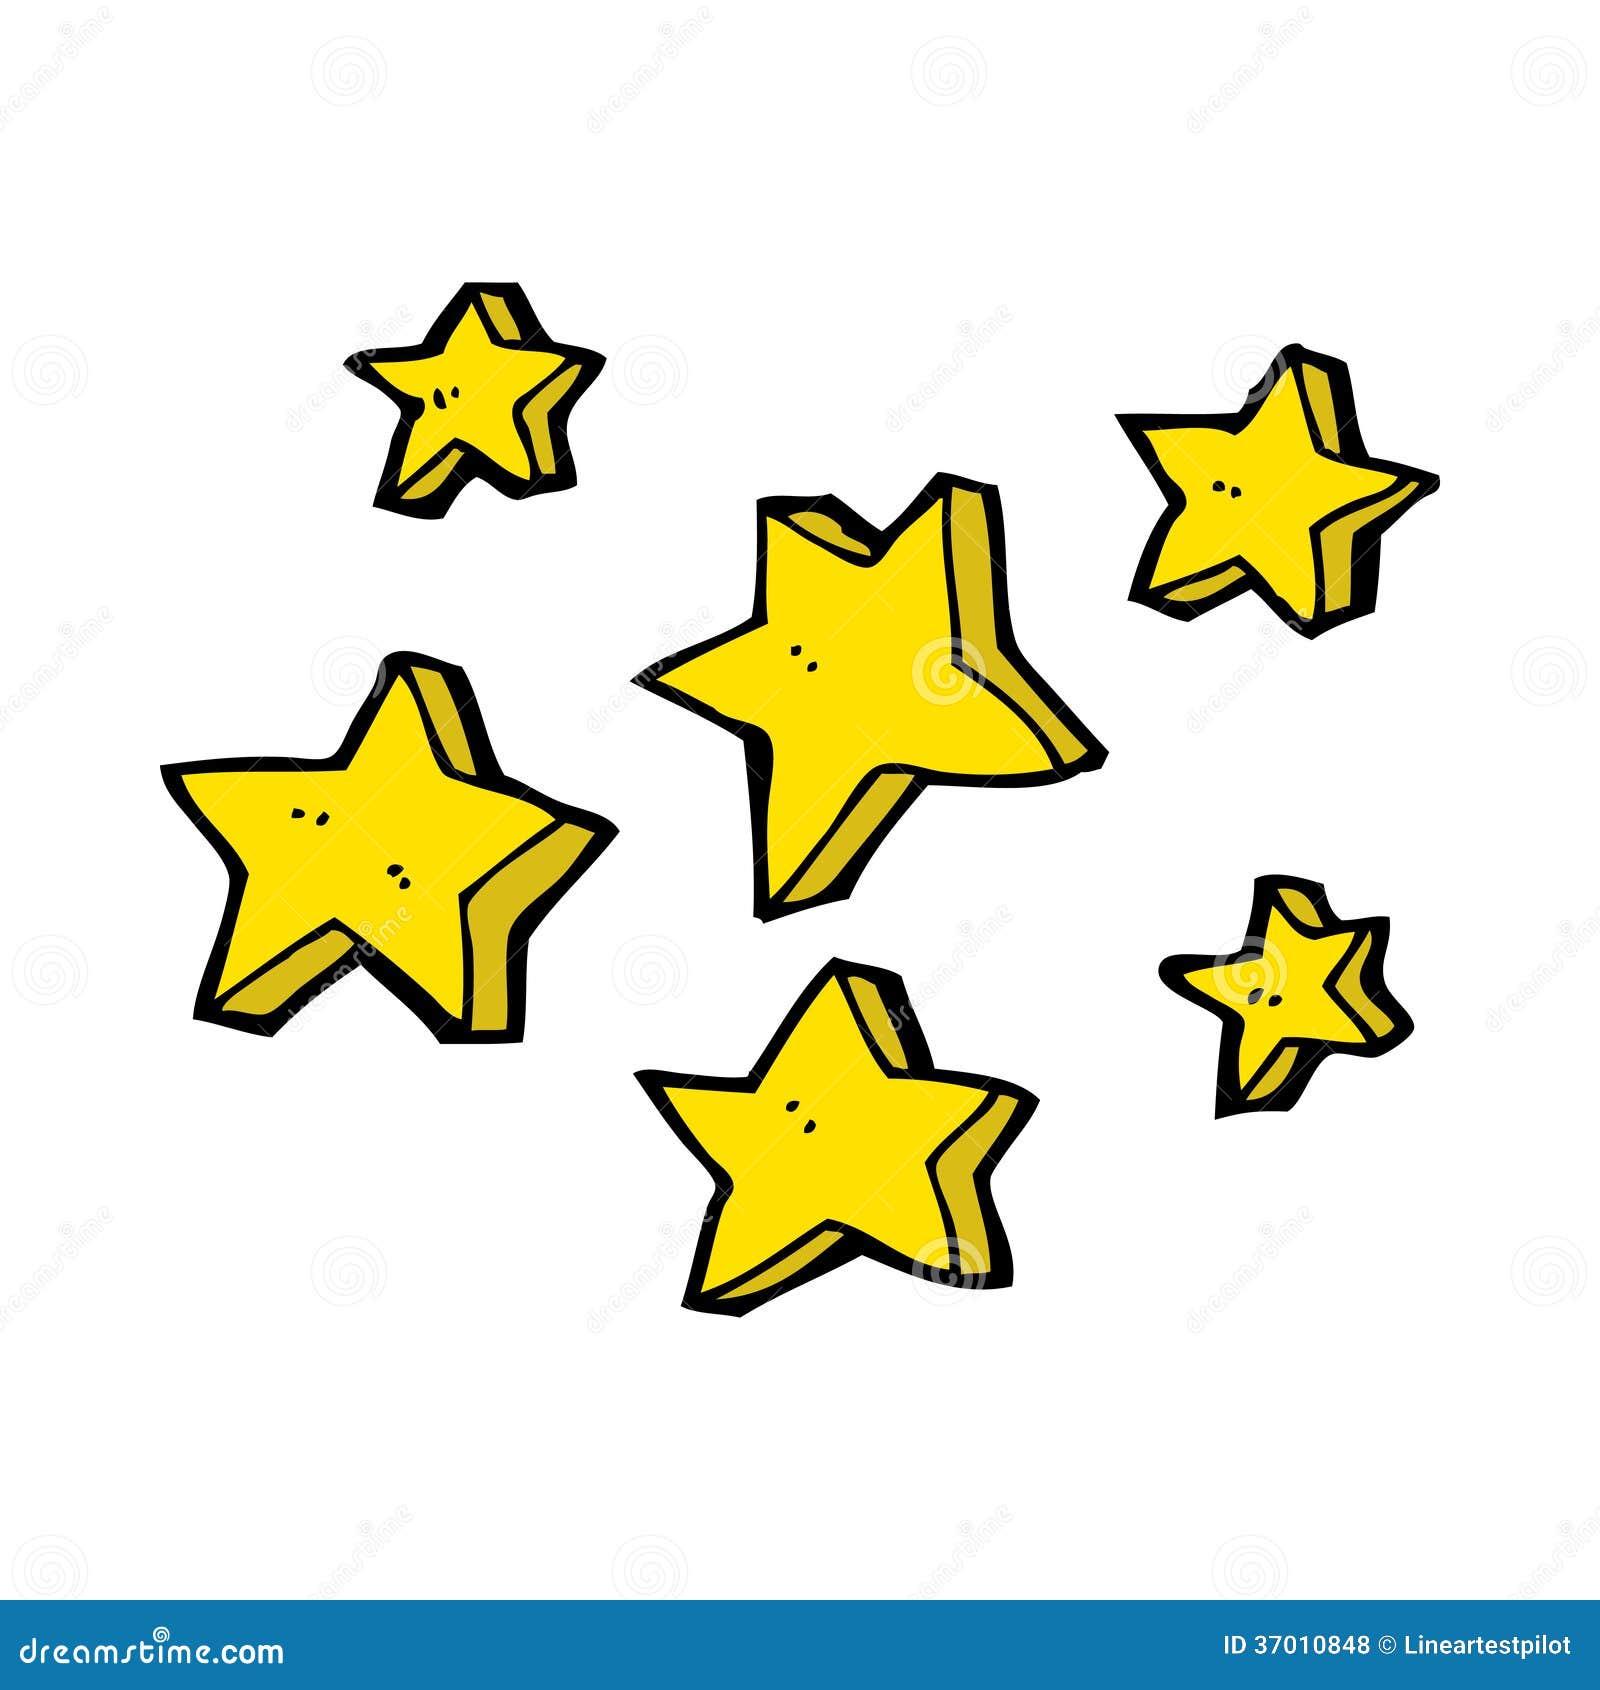 Cartoon stars stock illustration. Illustration of symbol ...